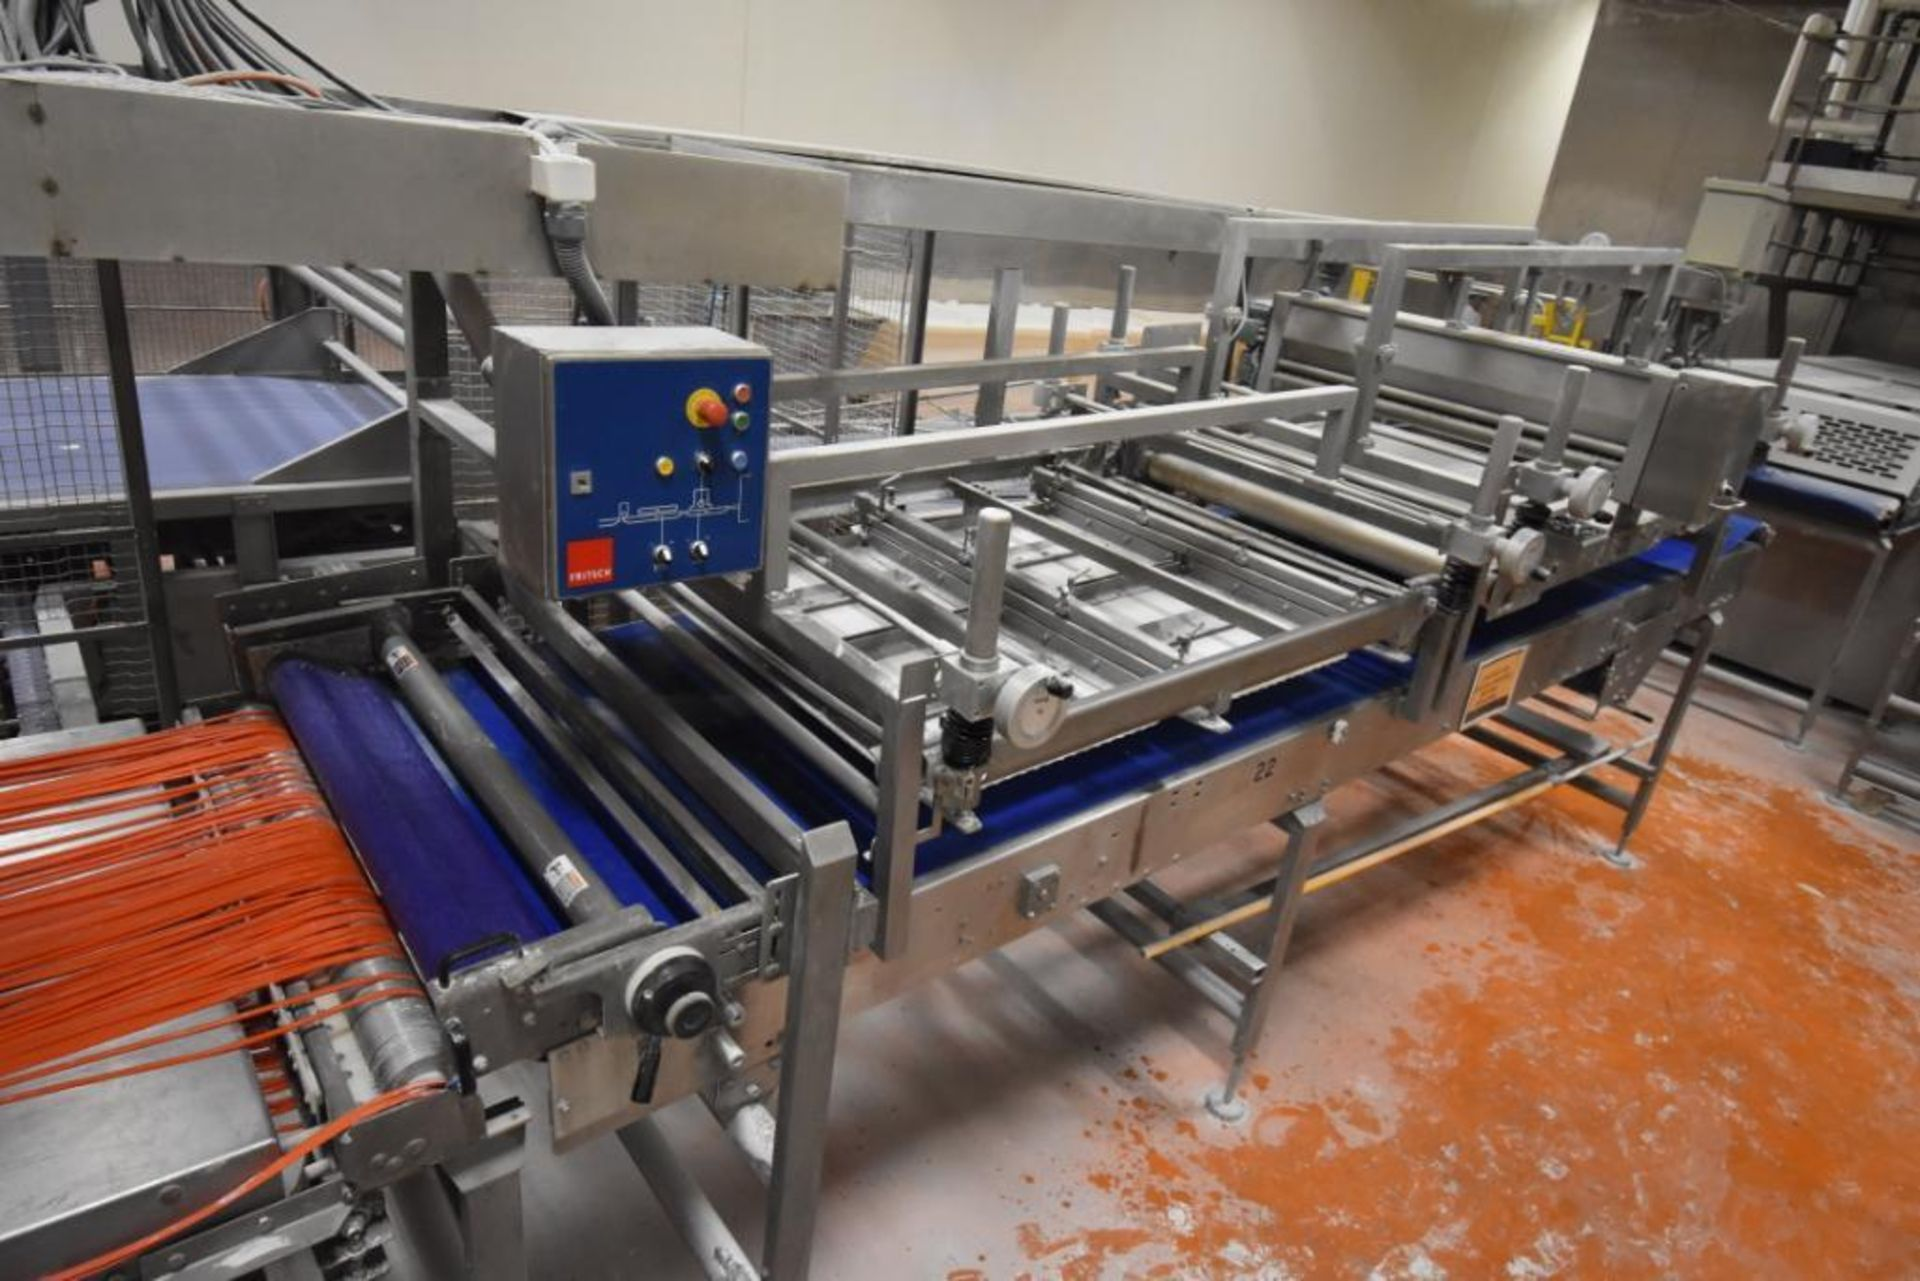 2007 Fritsch Laminator 3000 dough line - Image 184 of 280